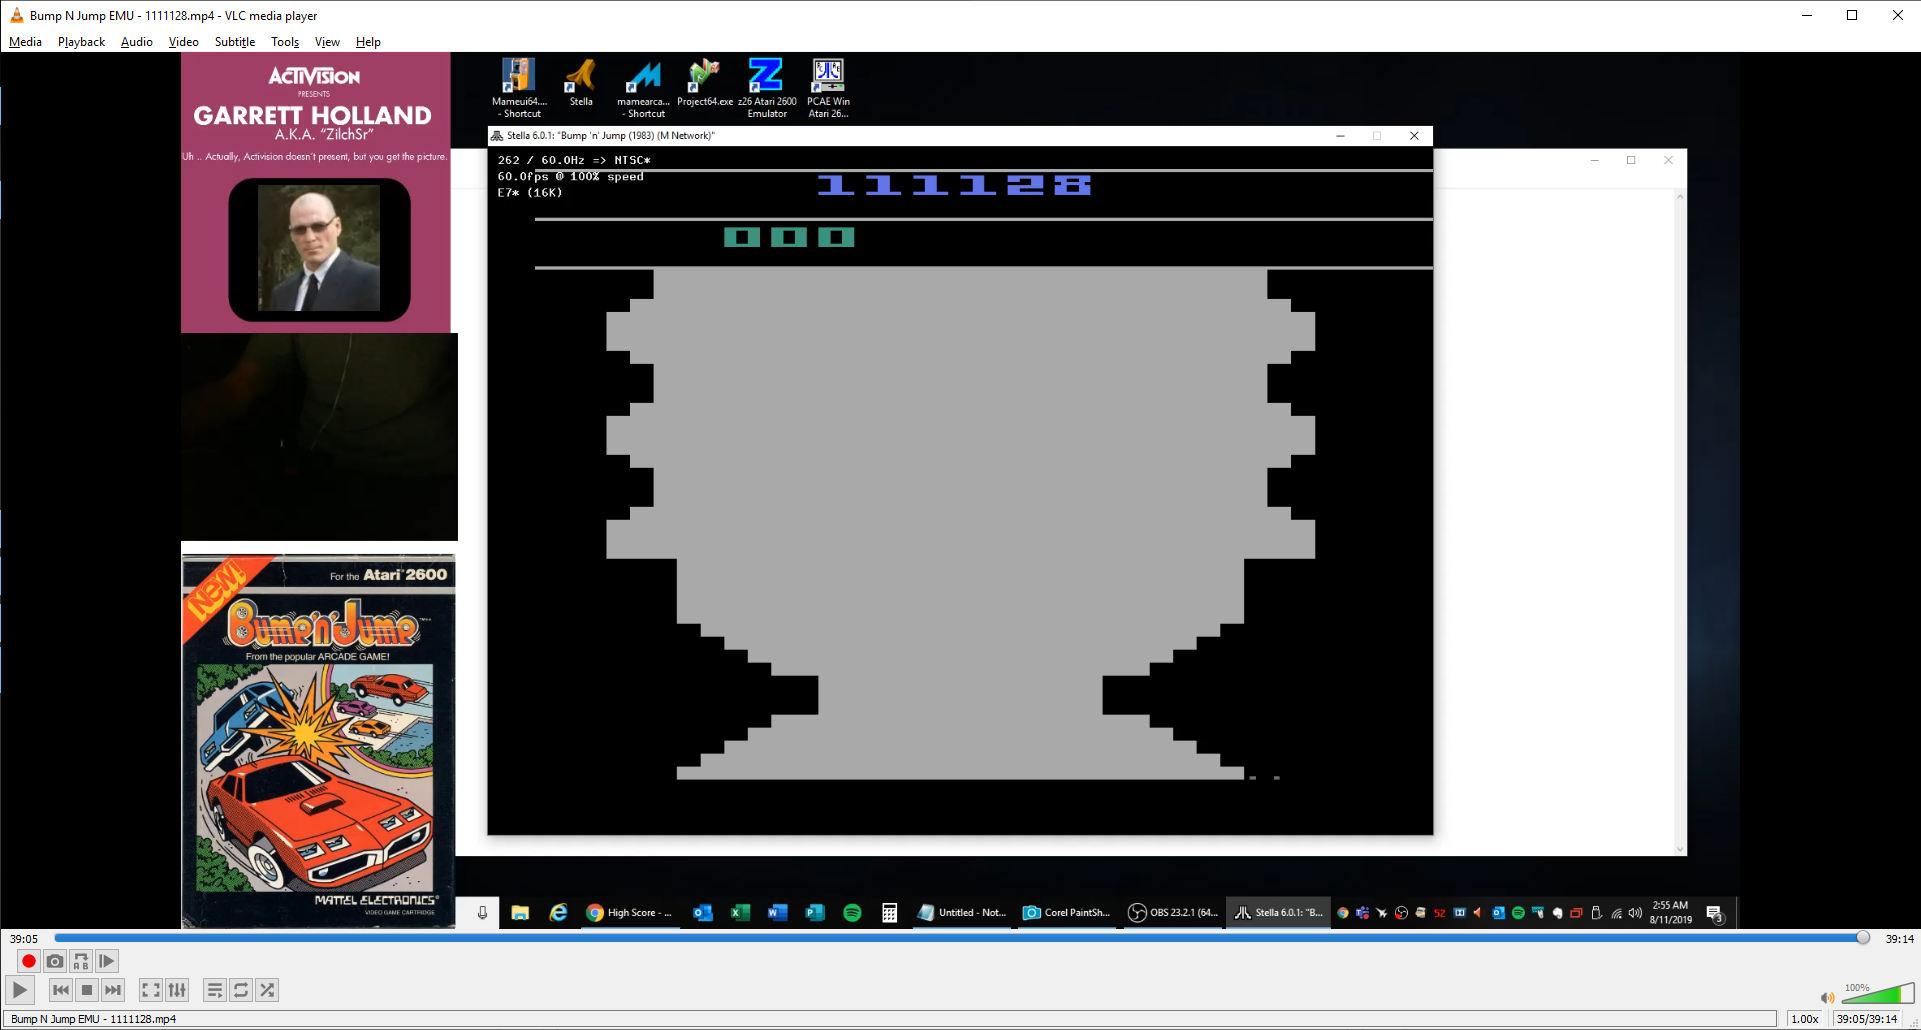 ZilchSr: Bump N Jump (Atari 2600 Emulated) 1,111,128 points on 2019-08-11 02:05:47